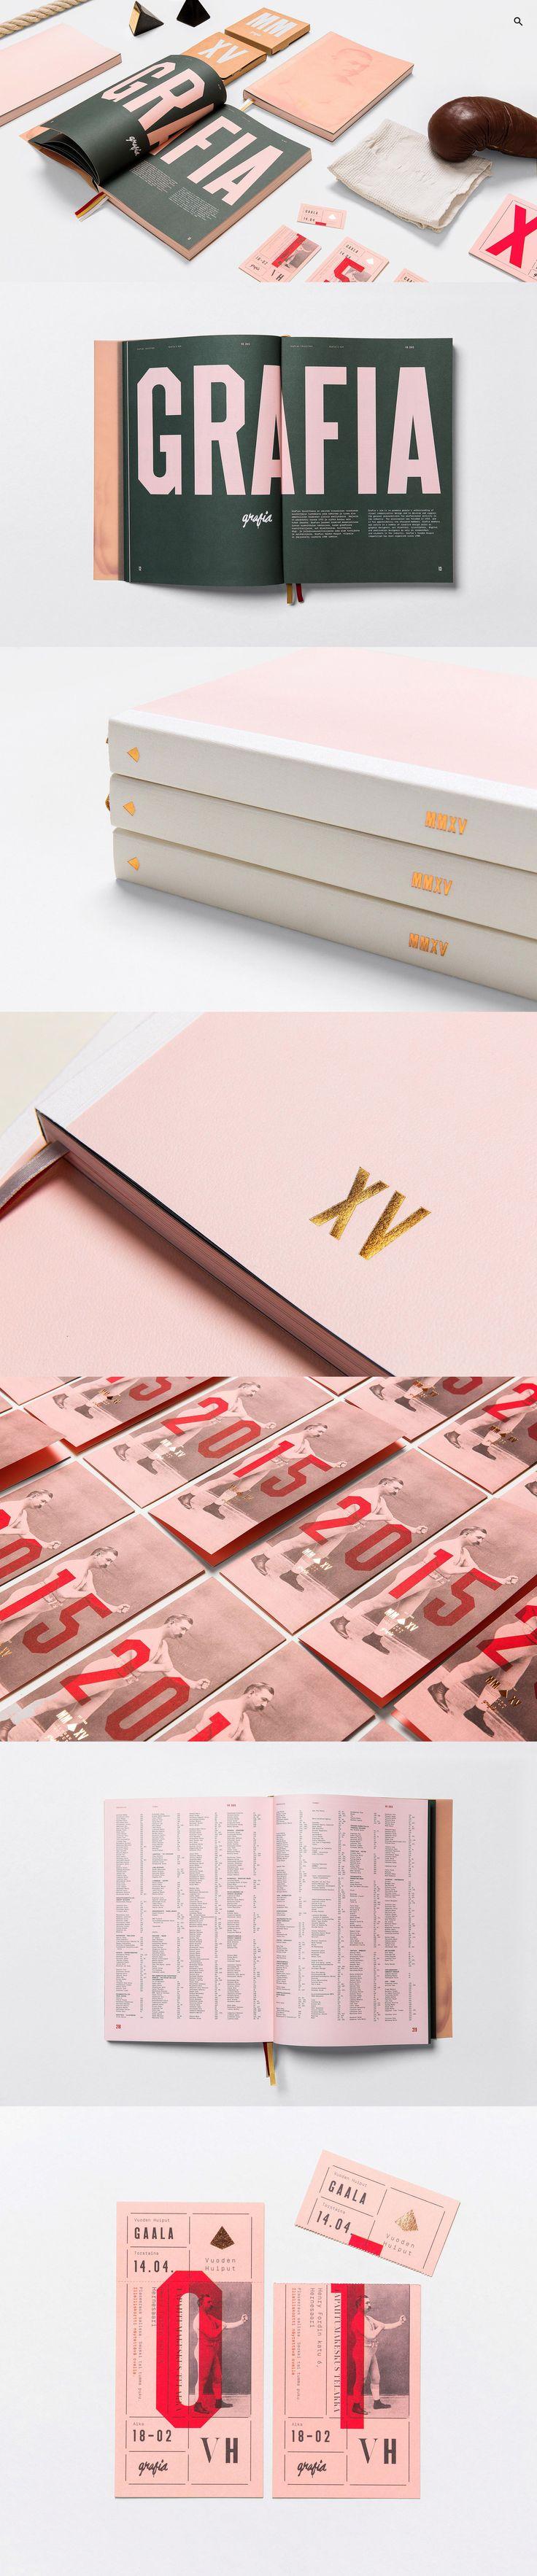 Amazing graphic design & editorial Layout   By Kuudes